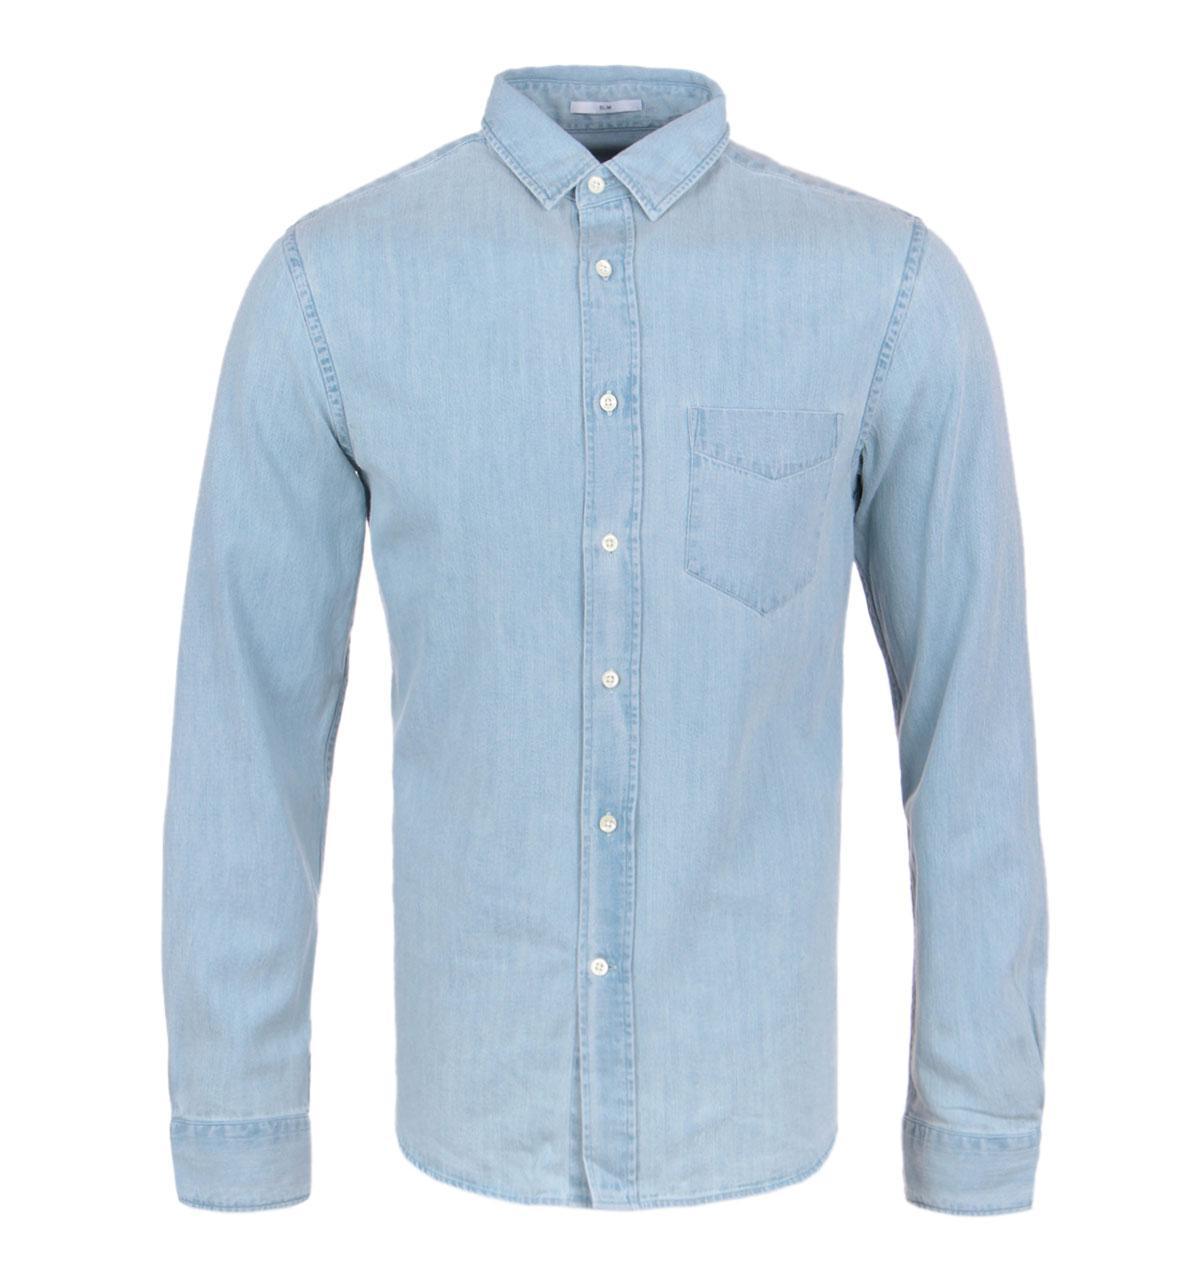 5fa5c504ed4 Gant Rugger Indigo Wash Blue Denim Long Sleeve Slim Fit Shirt in ...